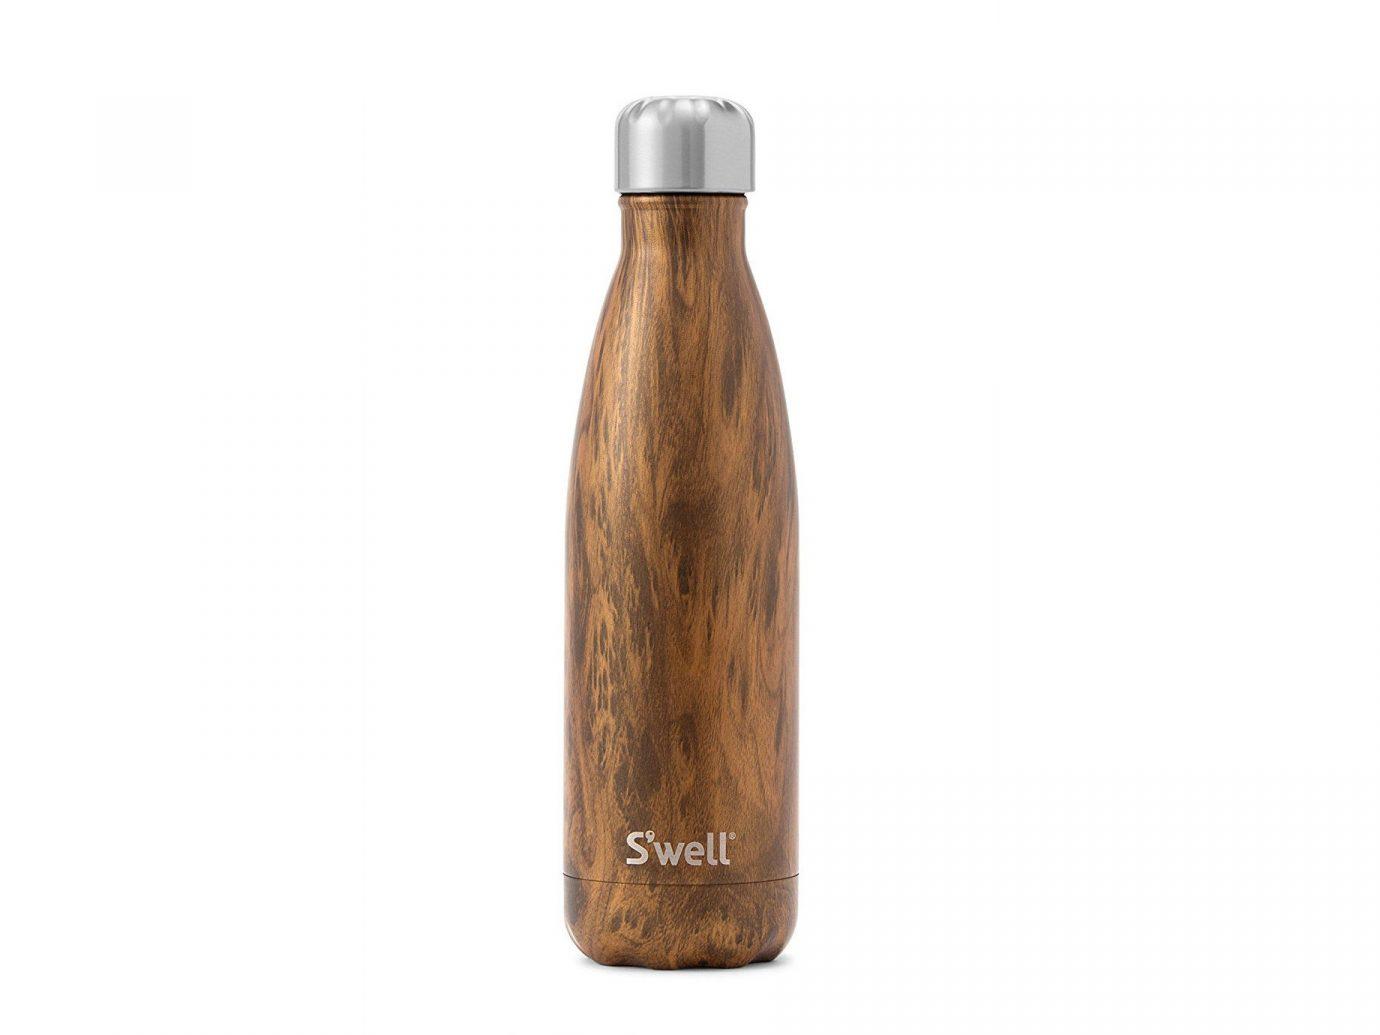 Beach Style + Design Travel Shop water bottle bottle glass bottle product